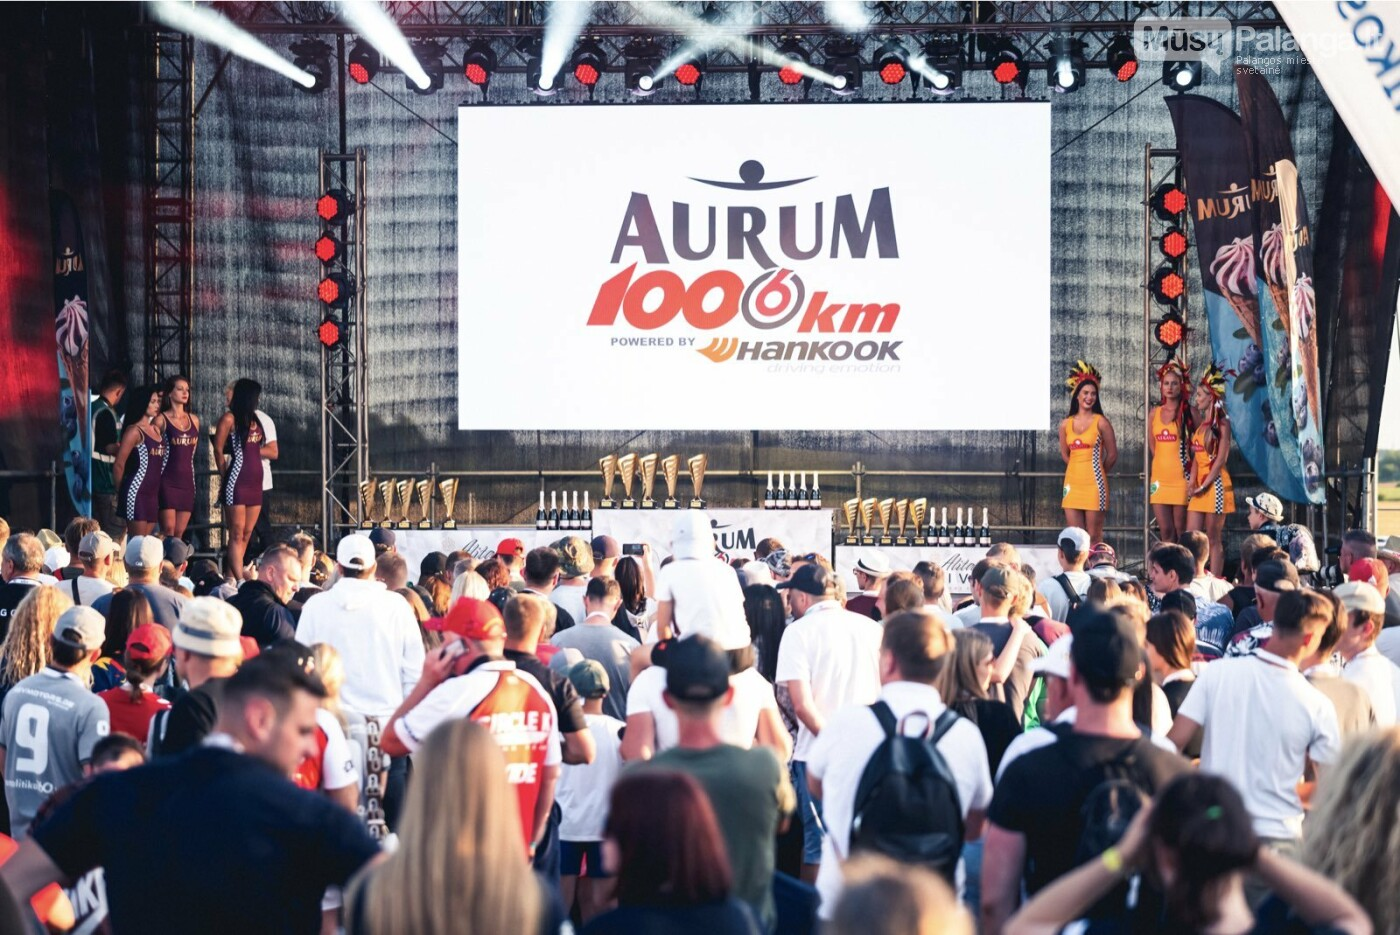 "22-osios ""Aurum 1006 km lenktynės"" – 2021 m liepos 14-17 d.d. , nuotrauka-12, Vytauto PILKAUSKO, Arno STRUMILOS ir Gedmanto KROPIO nuotr."